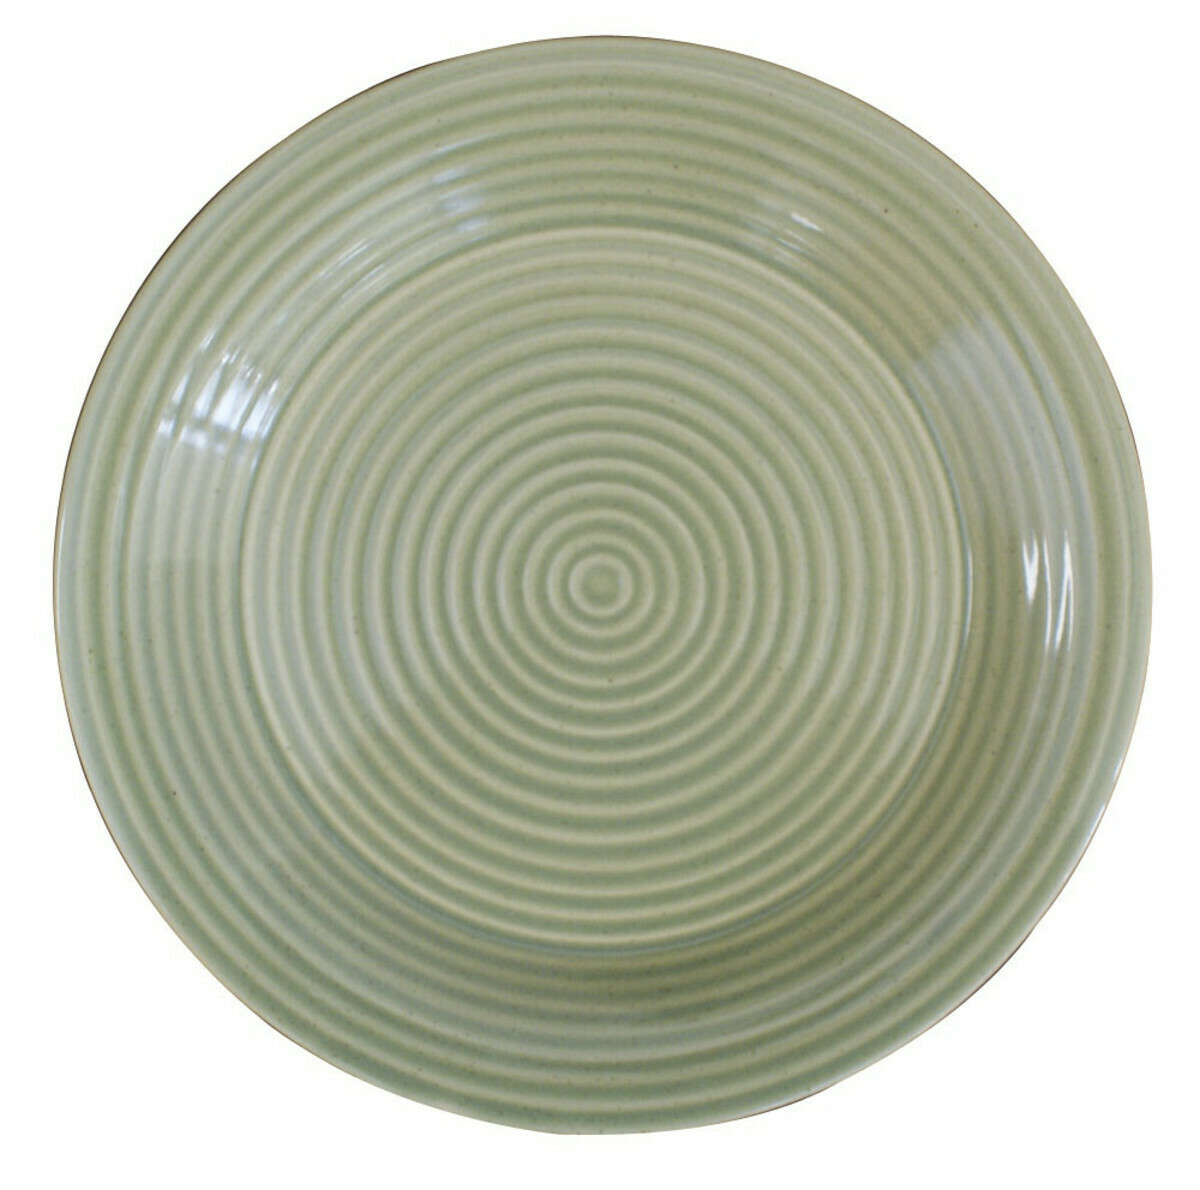 Avocado Serrano Salad Plate